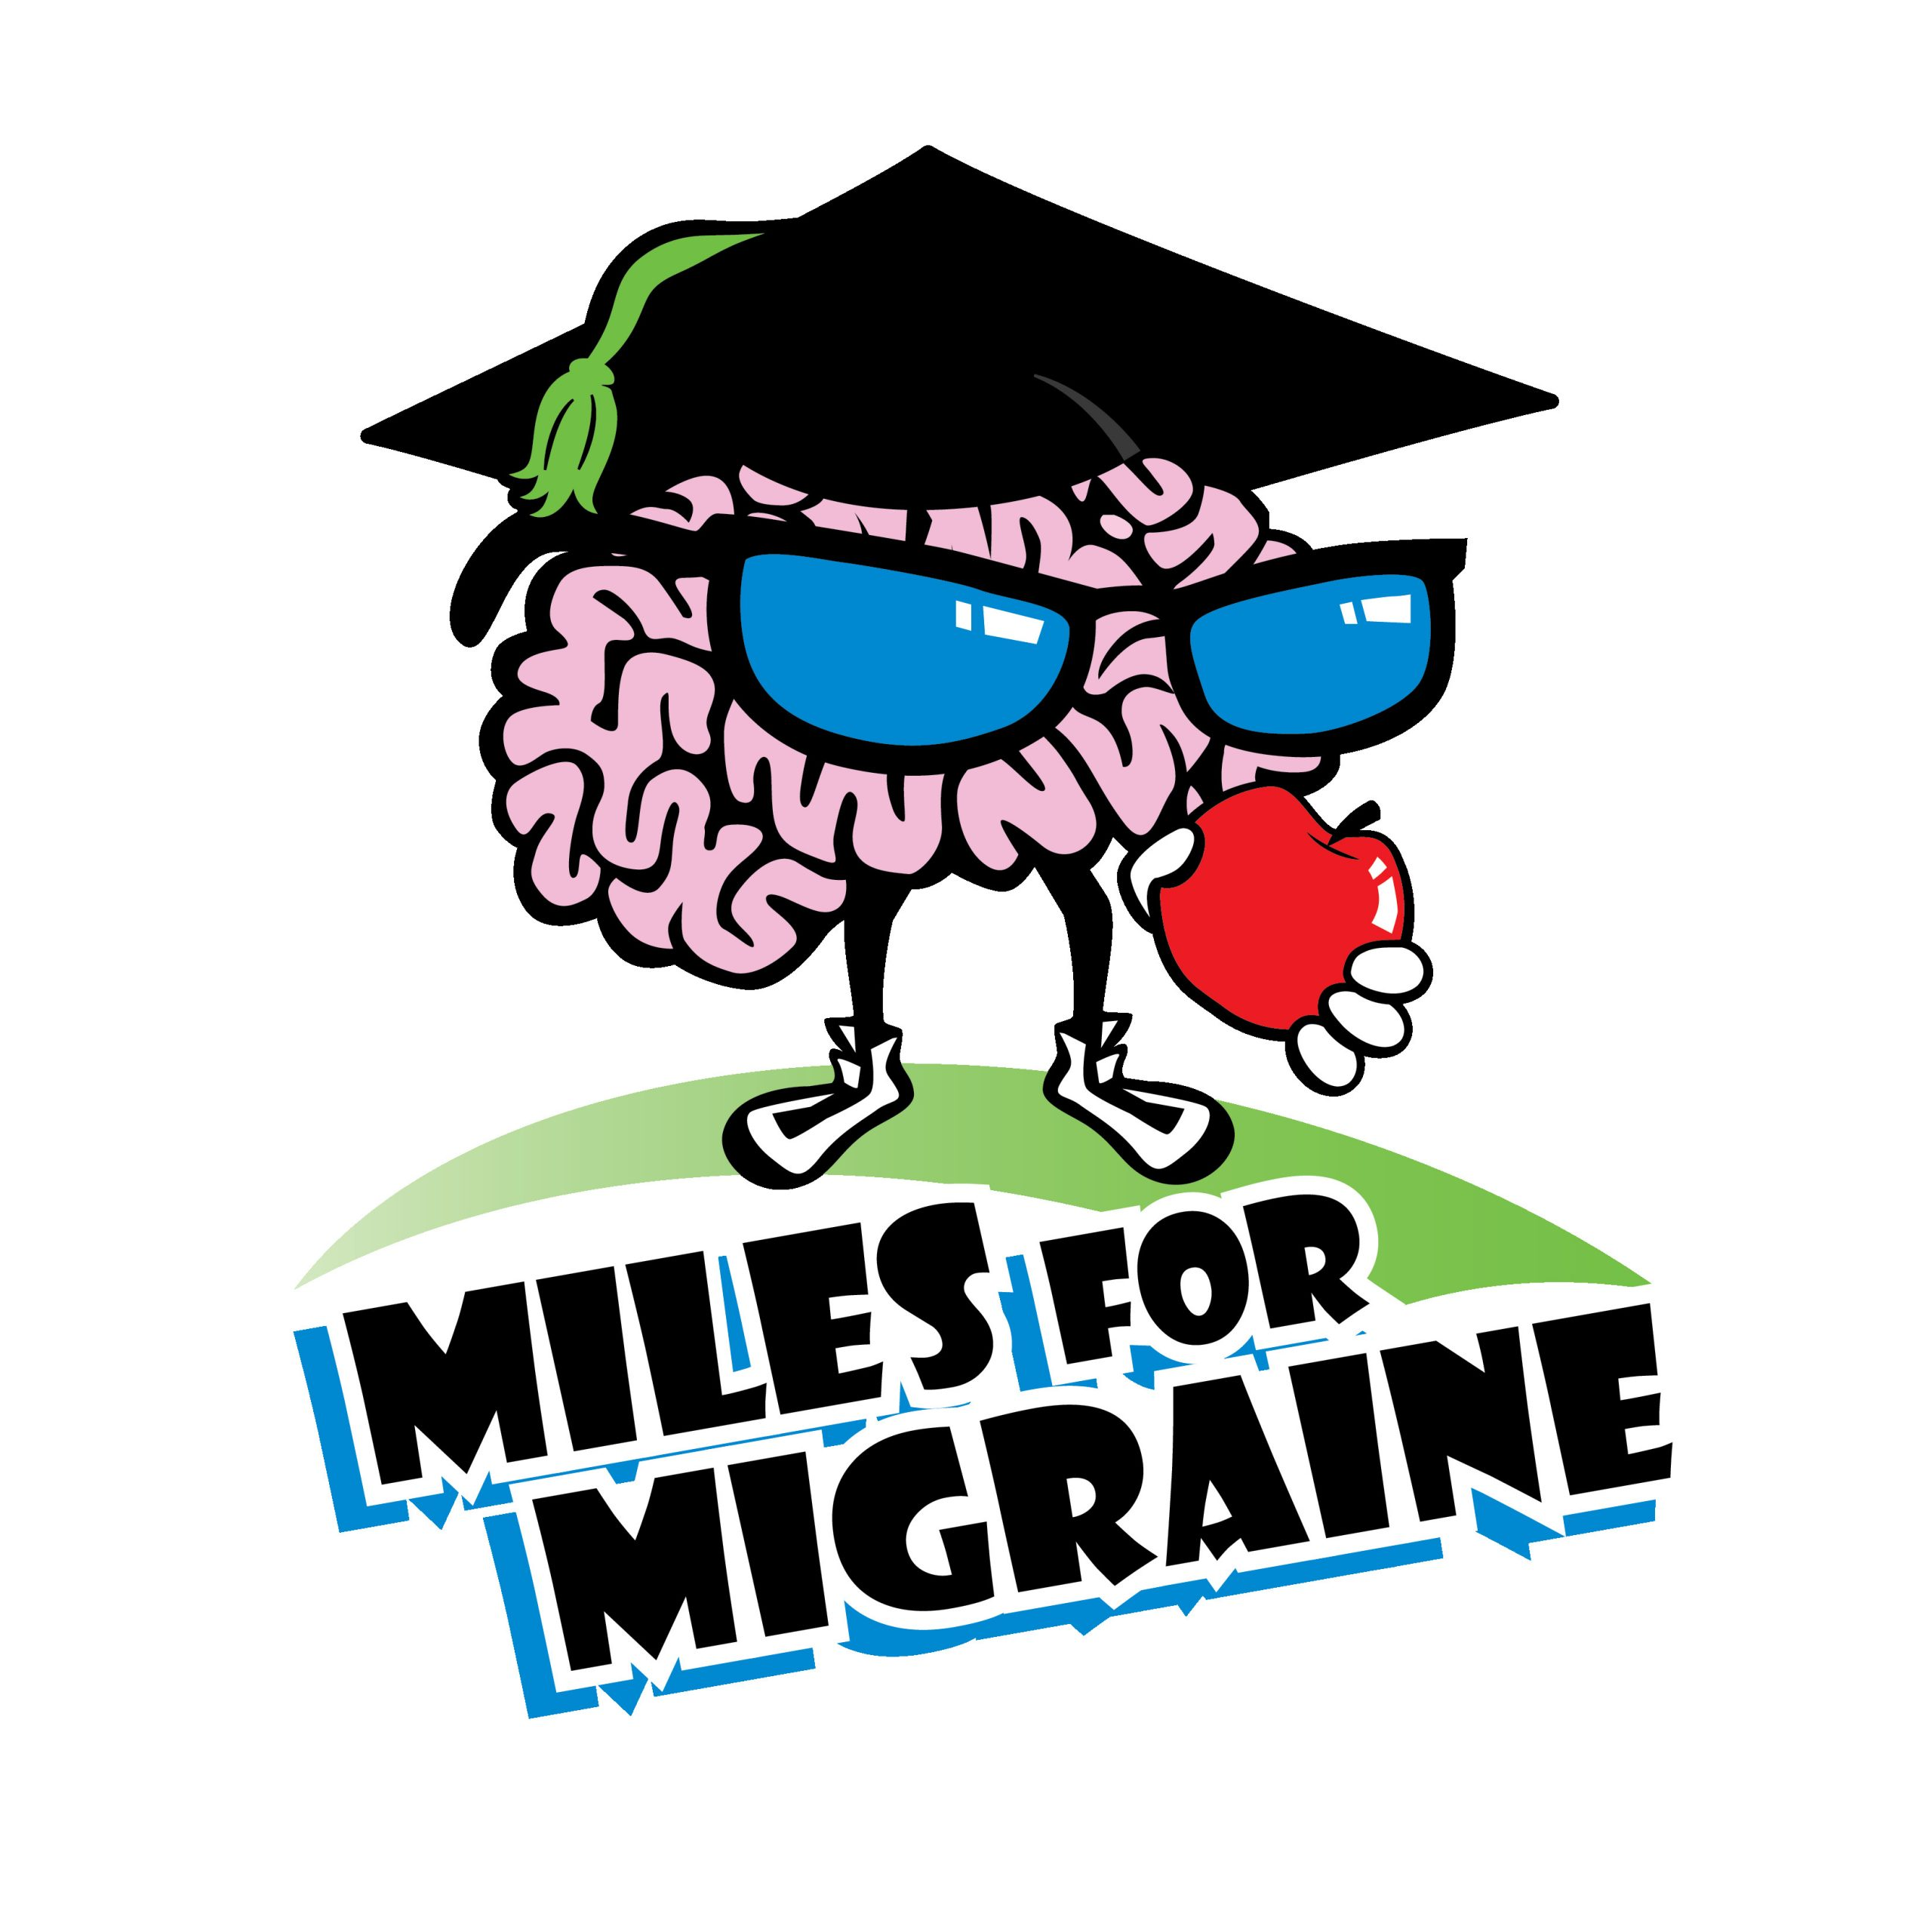 Miles for Migraine patient education day